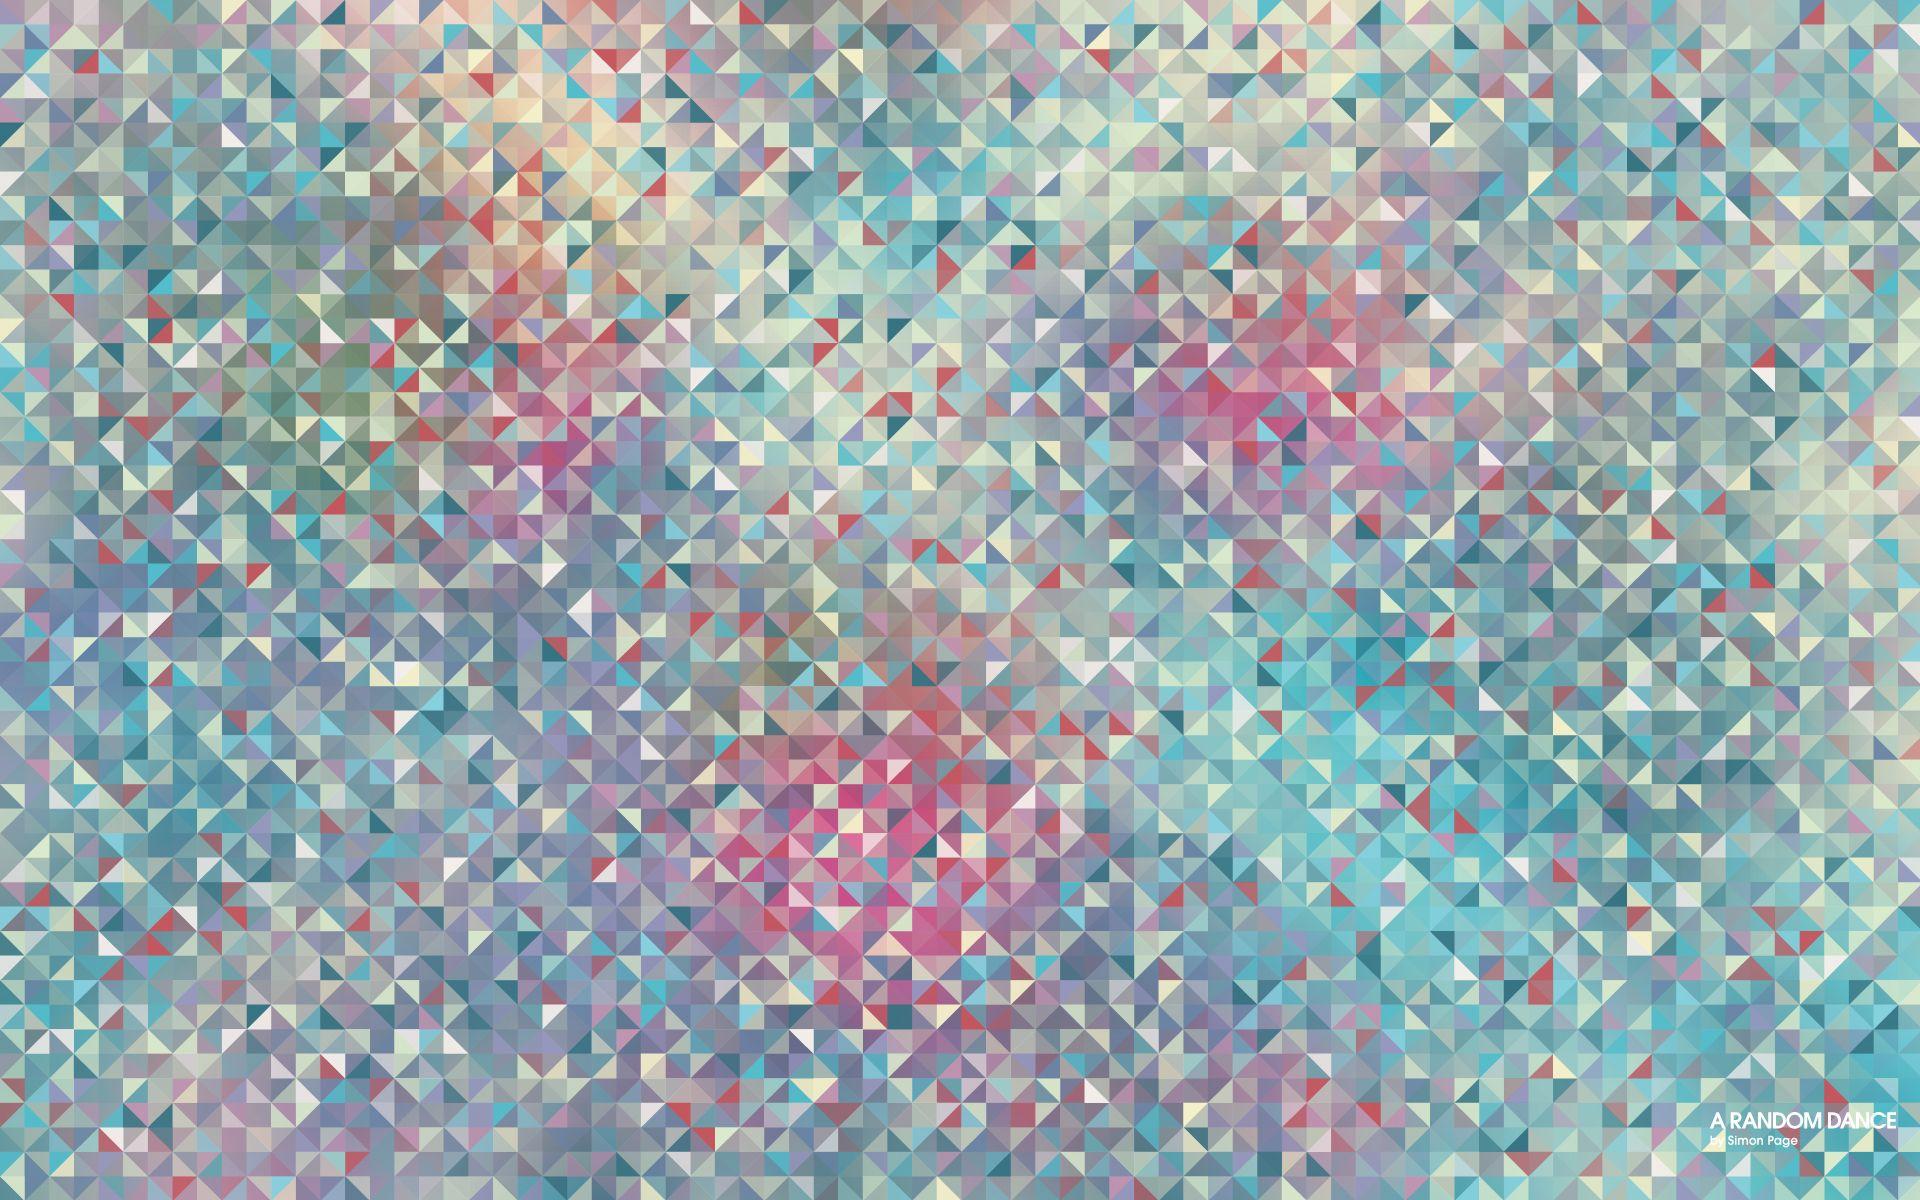 Ios 7 Iphone Wallpaper: Designs Wallpaper - 23739